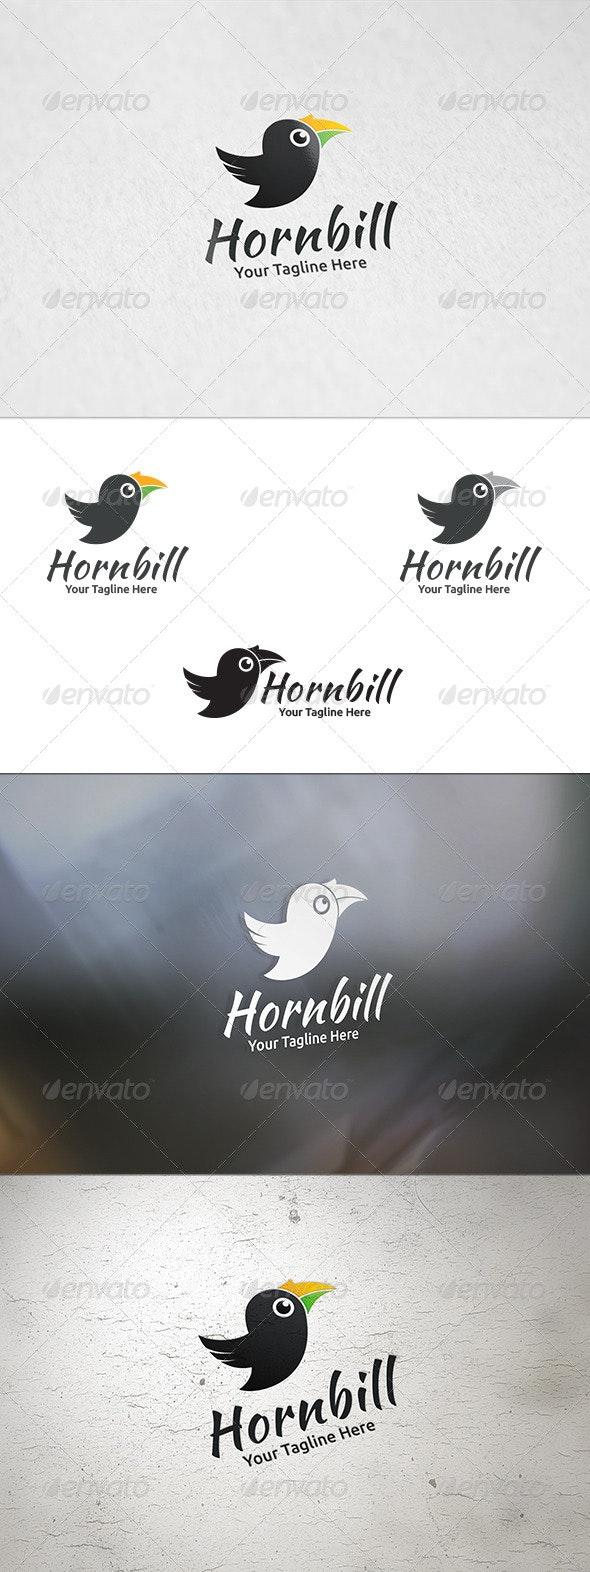 Hornbill - Logo Template - Animals Logo Templates